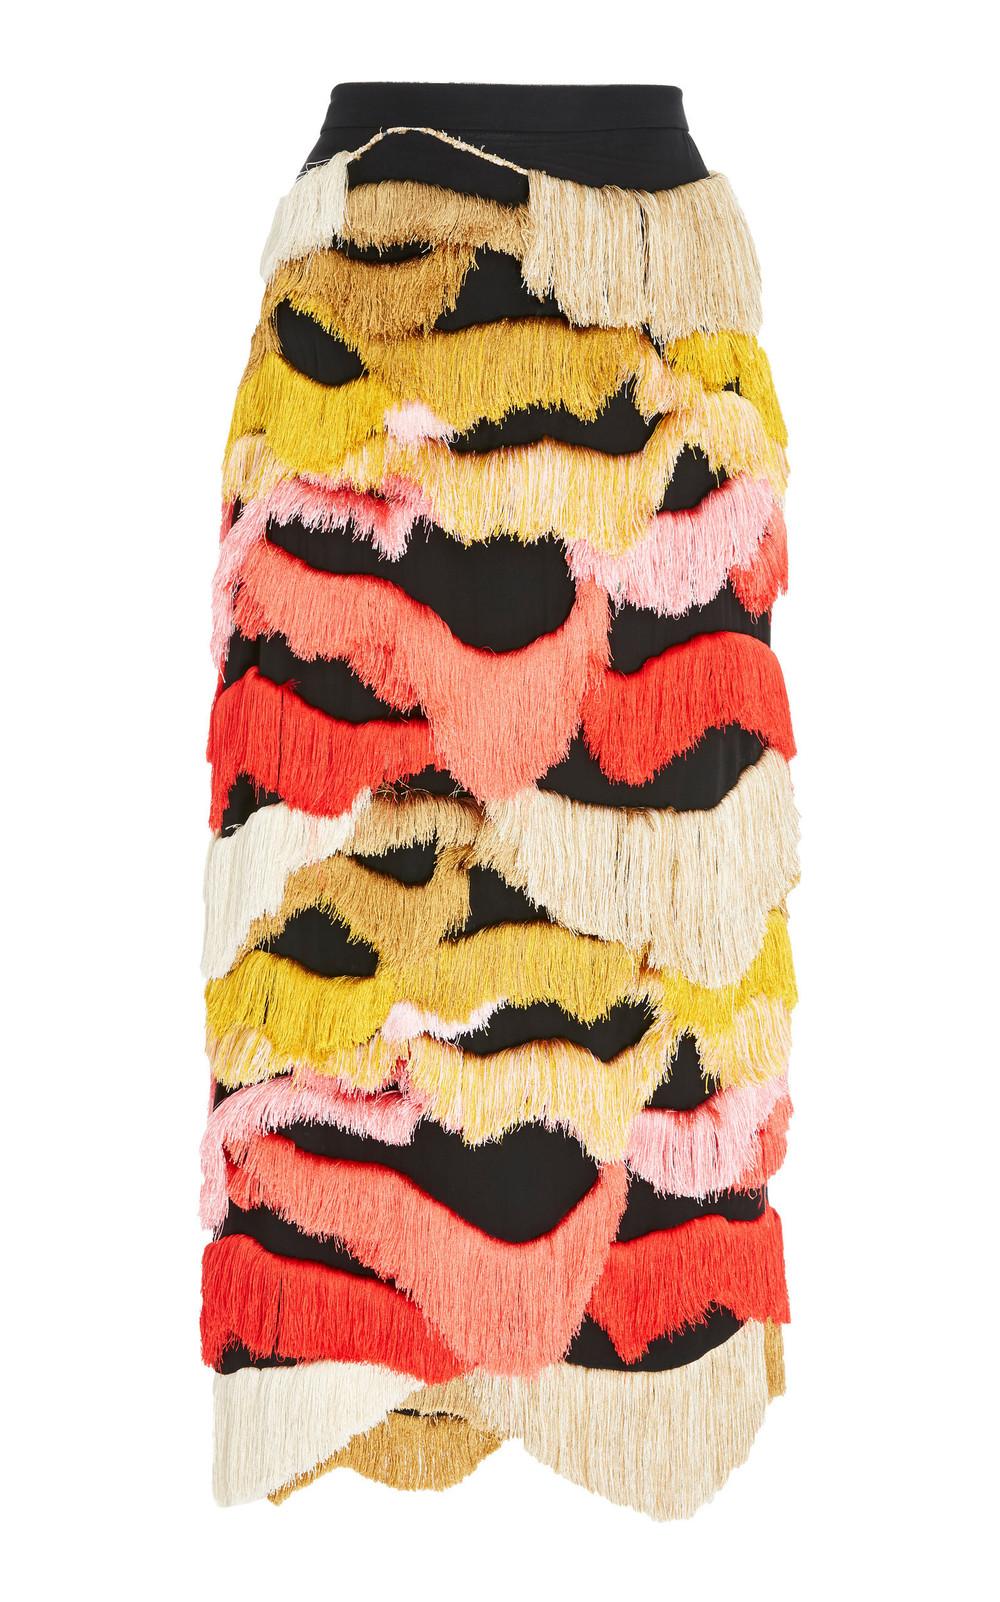 Rachel Comey Caposhi Fringe Pencil Skirt in metallic